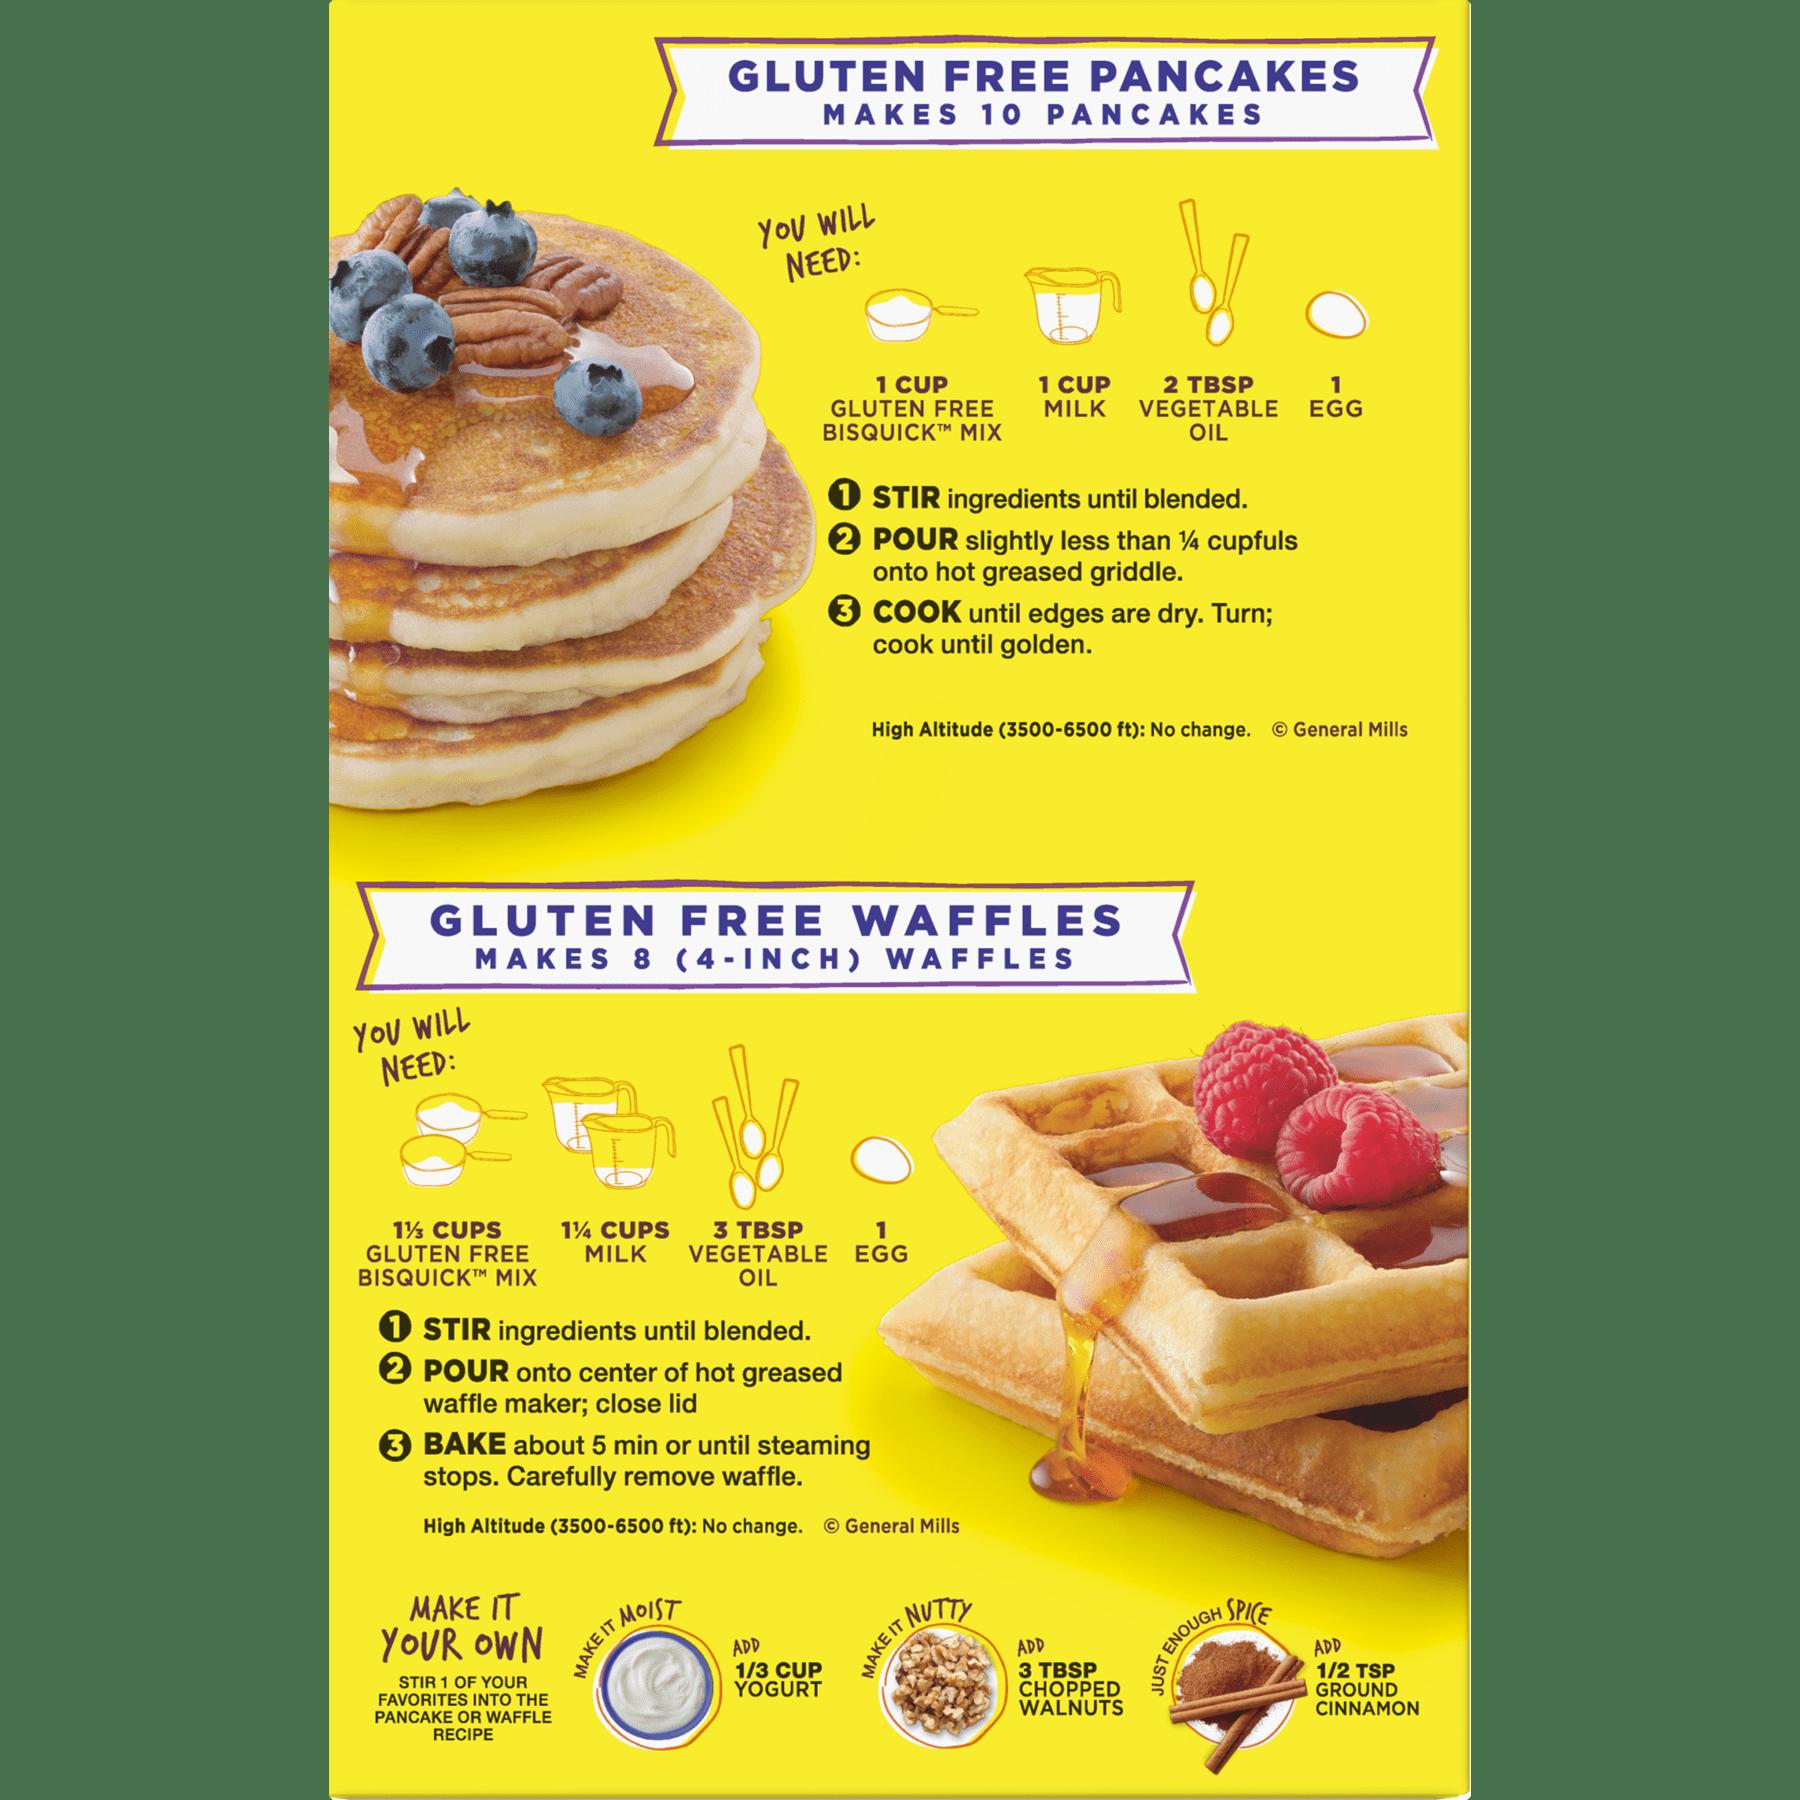 Bisquick pancake recipe without eggs or milk